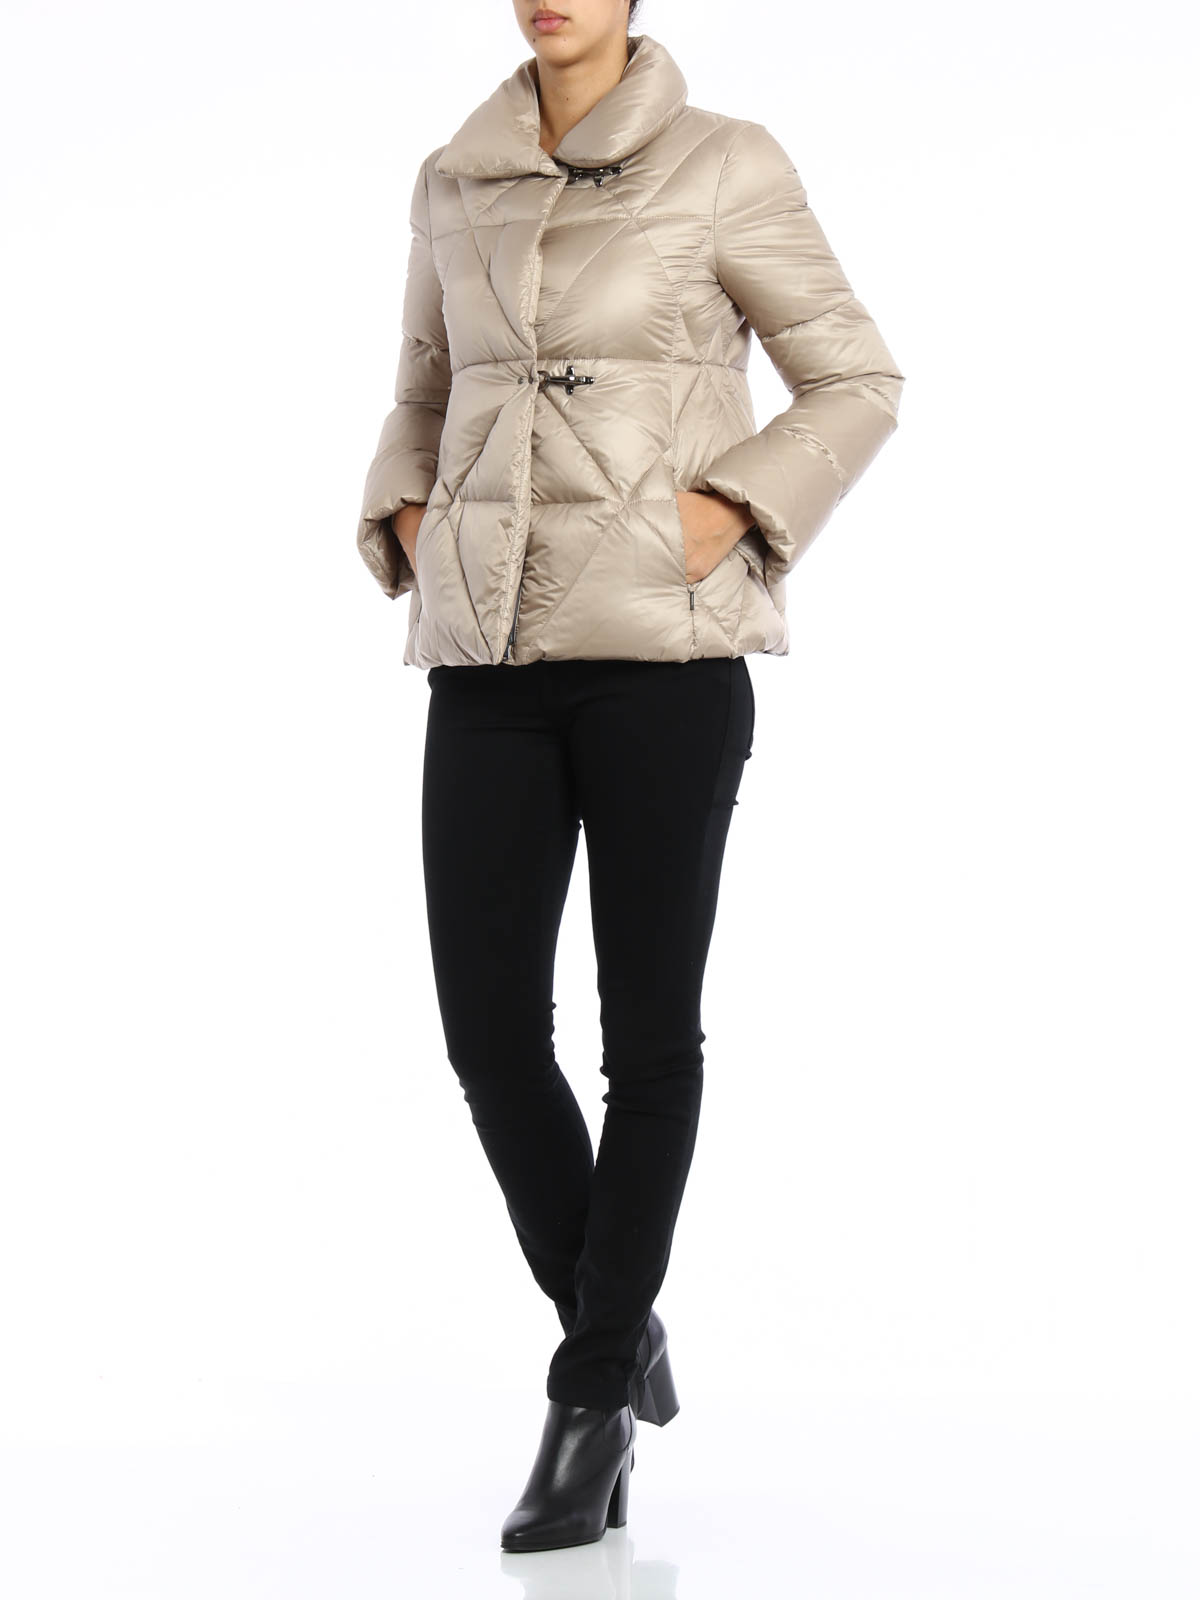 newest collection be07d 91d04 Fay - Piumino corto trapuntato - giacche imbottite ...